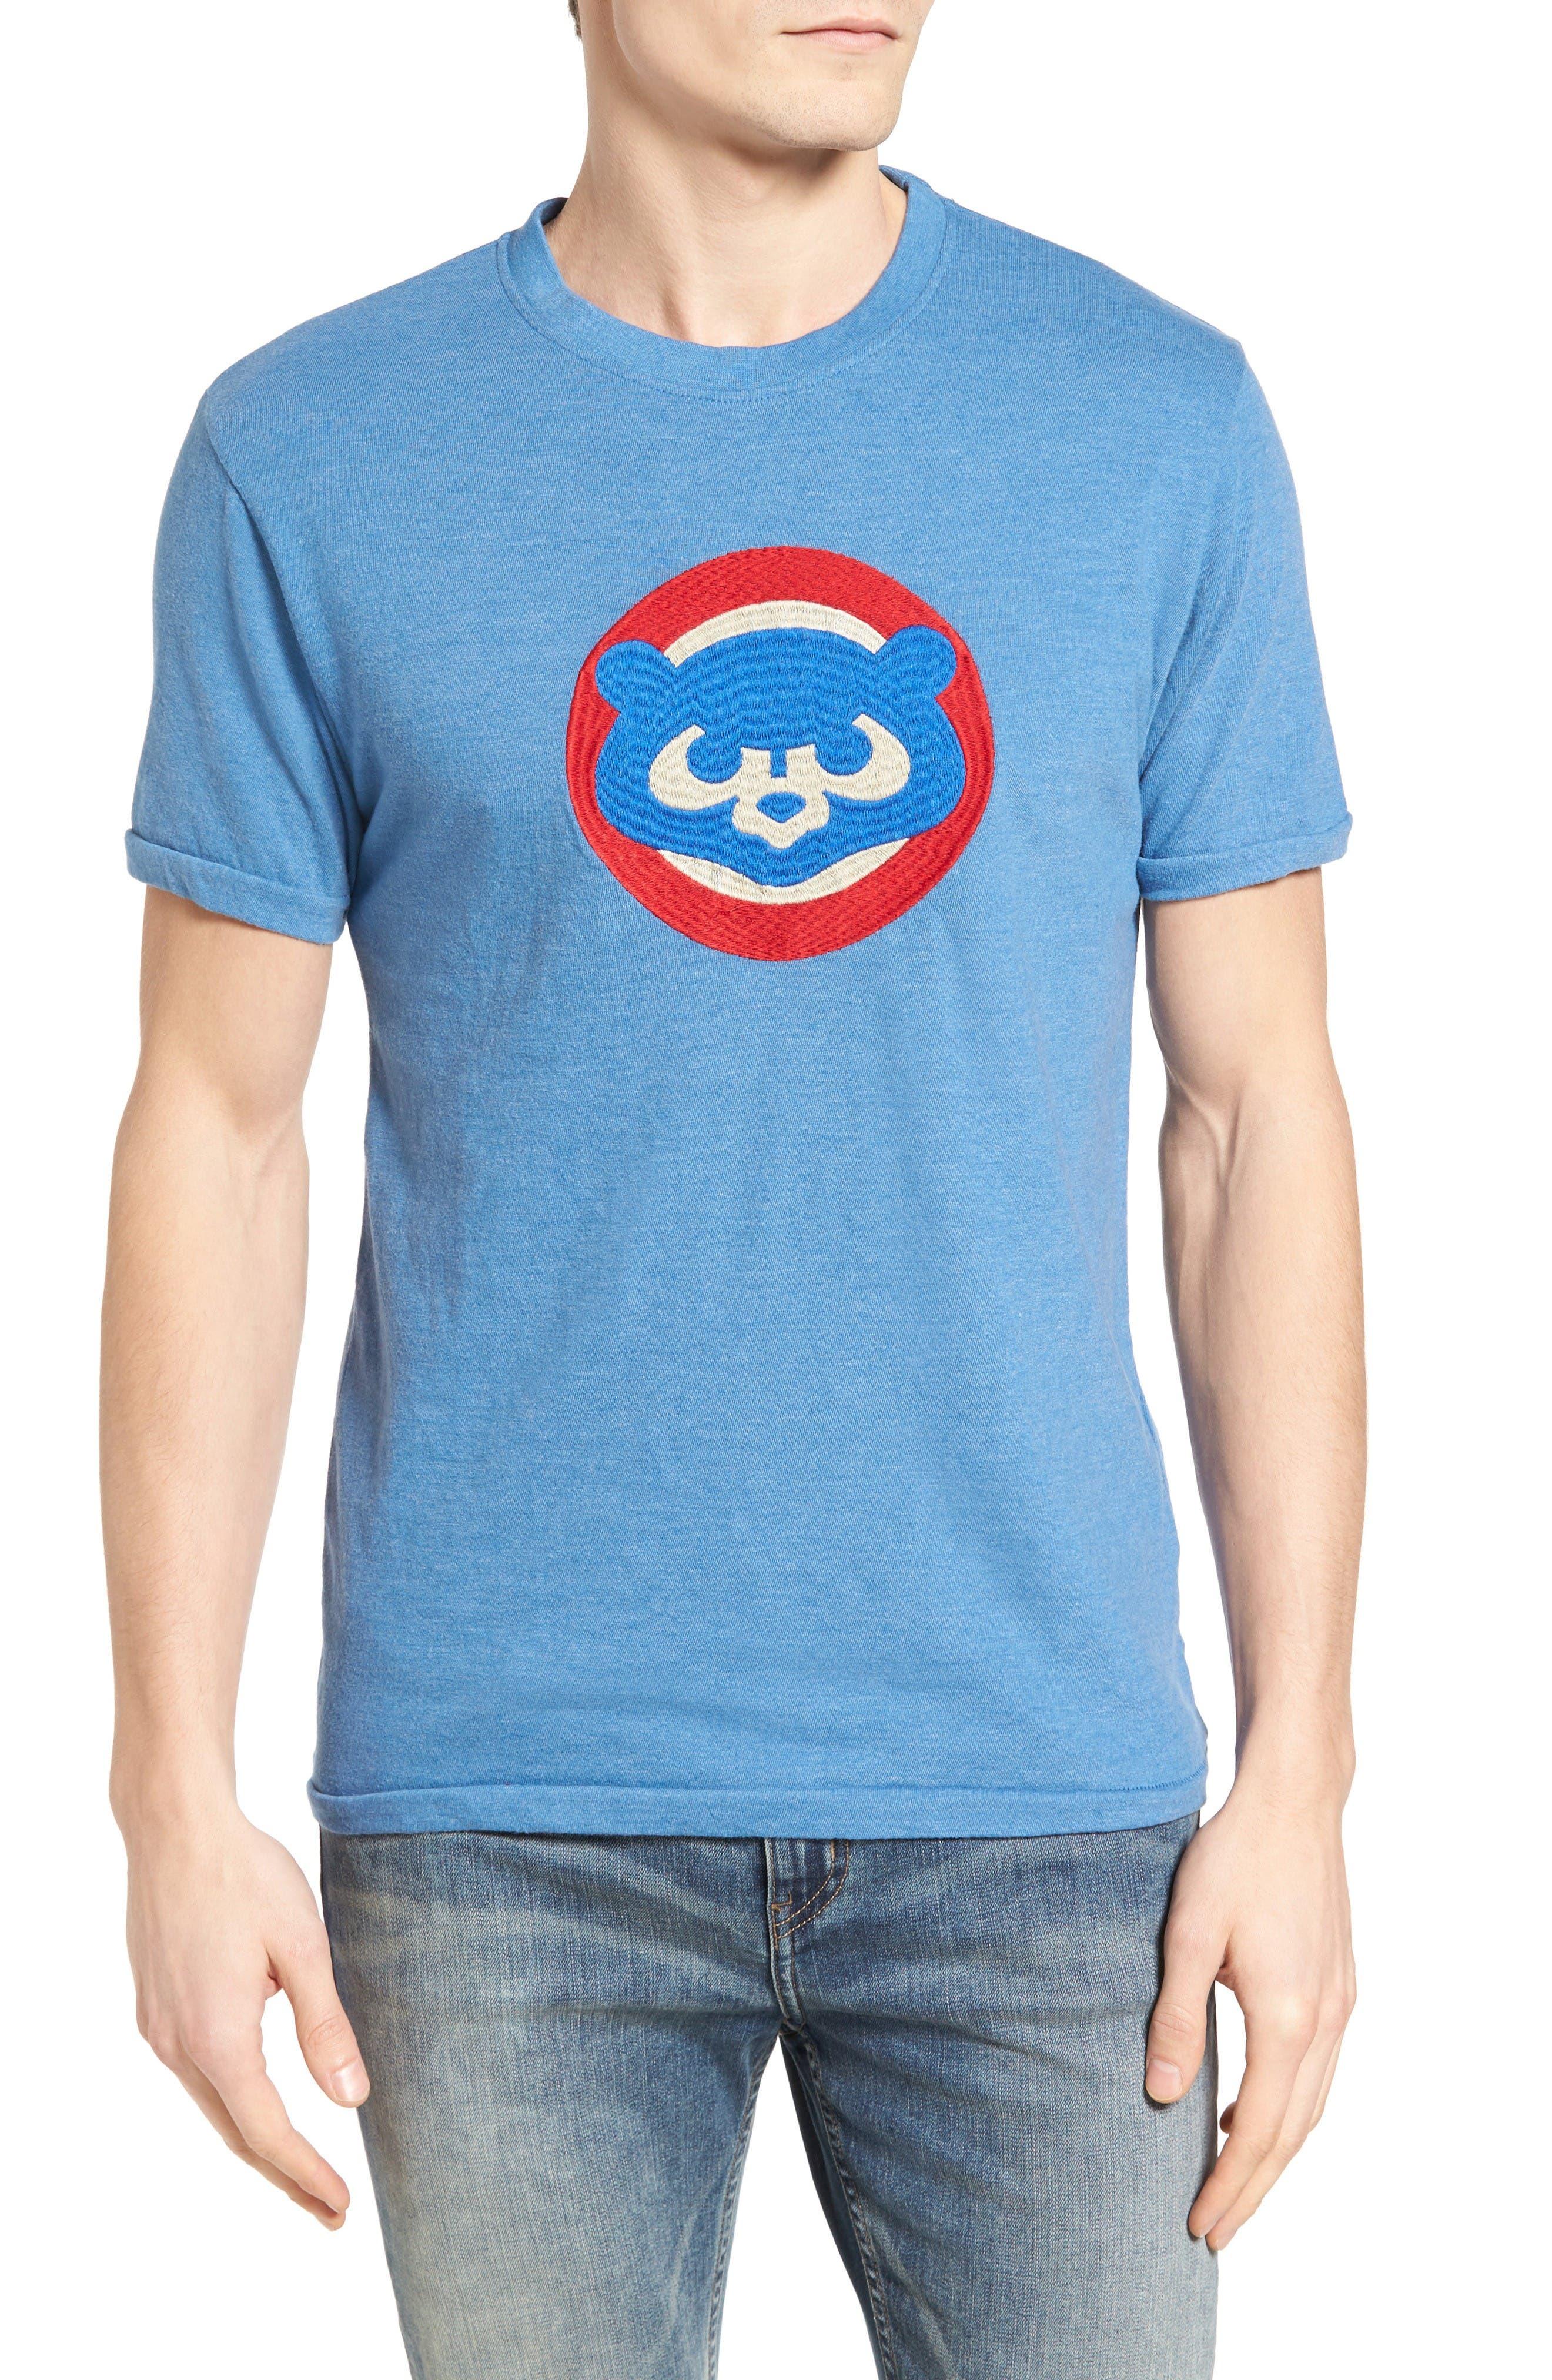 Hillwood Chicago Cubs T-Shirt,                         Main,                         color, Royal